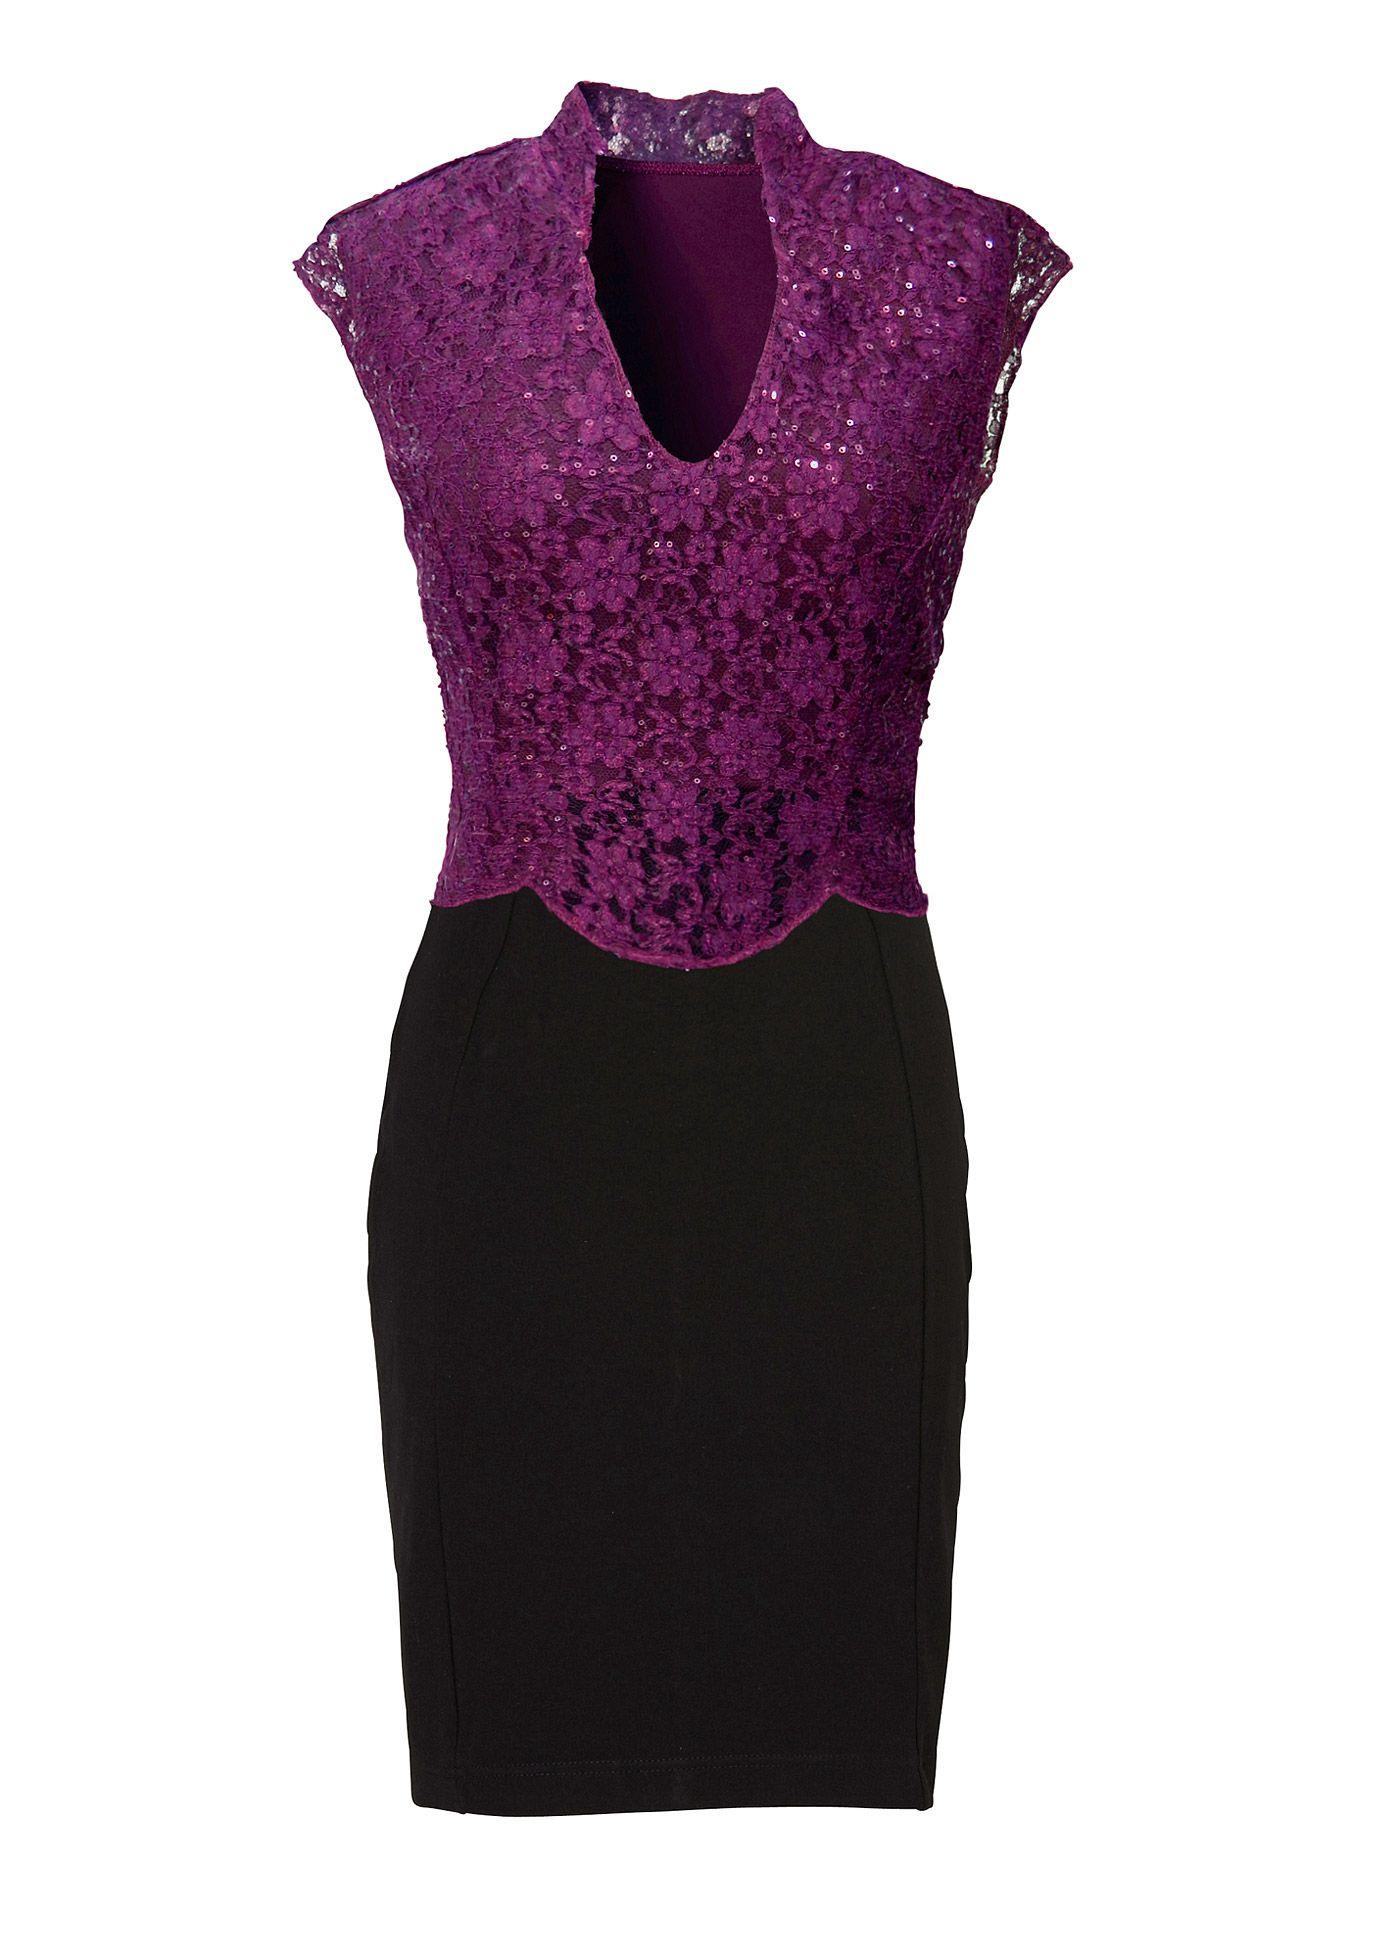 Vestido preto/fúcsia encomendar agora na loja on-line bonprix.de R ...